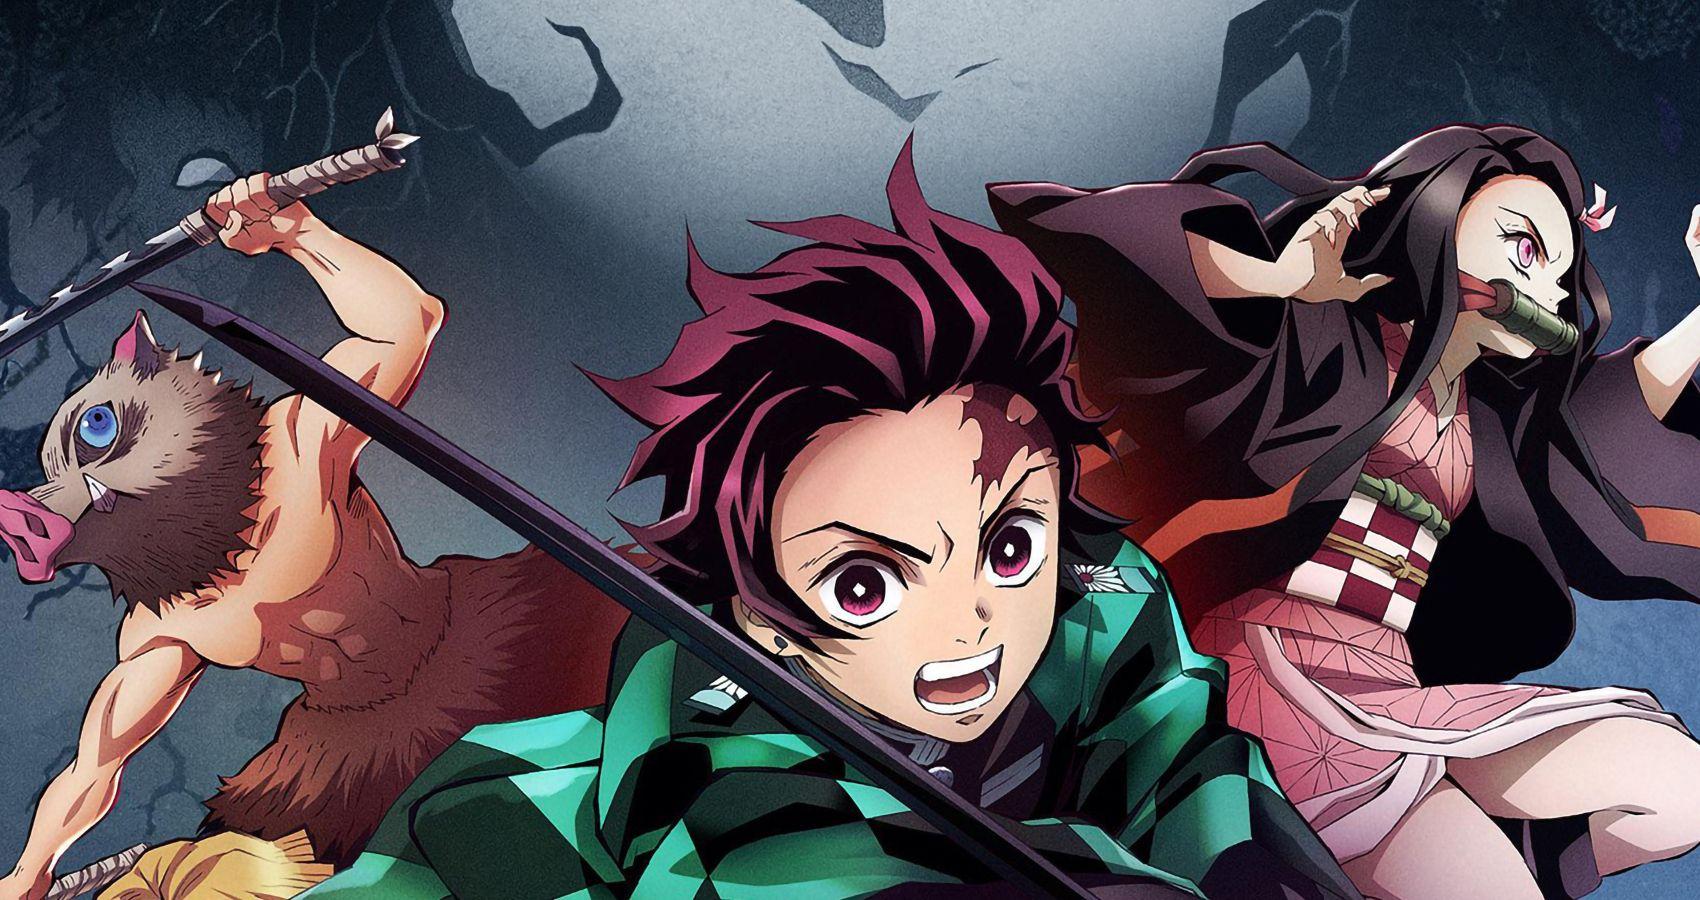 The 10 Best Anime Series On Crunchyroll According To Imdb Cbr